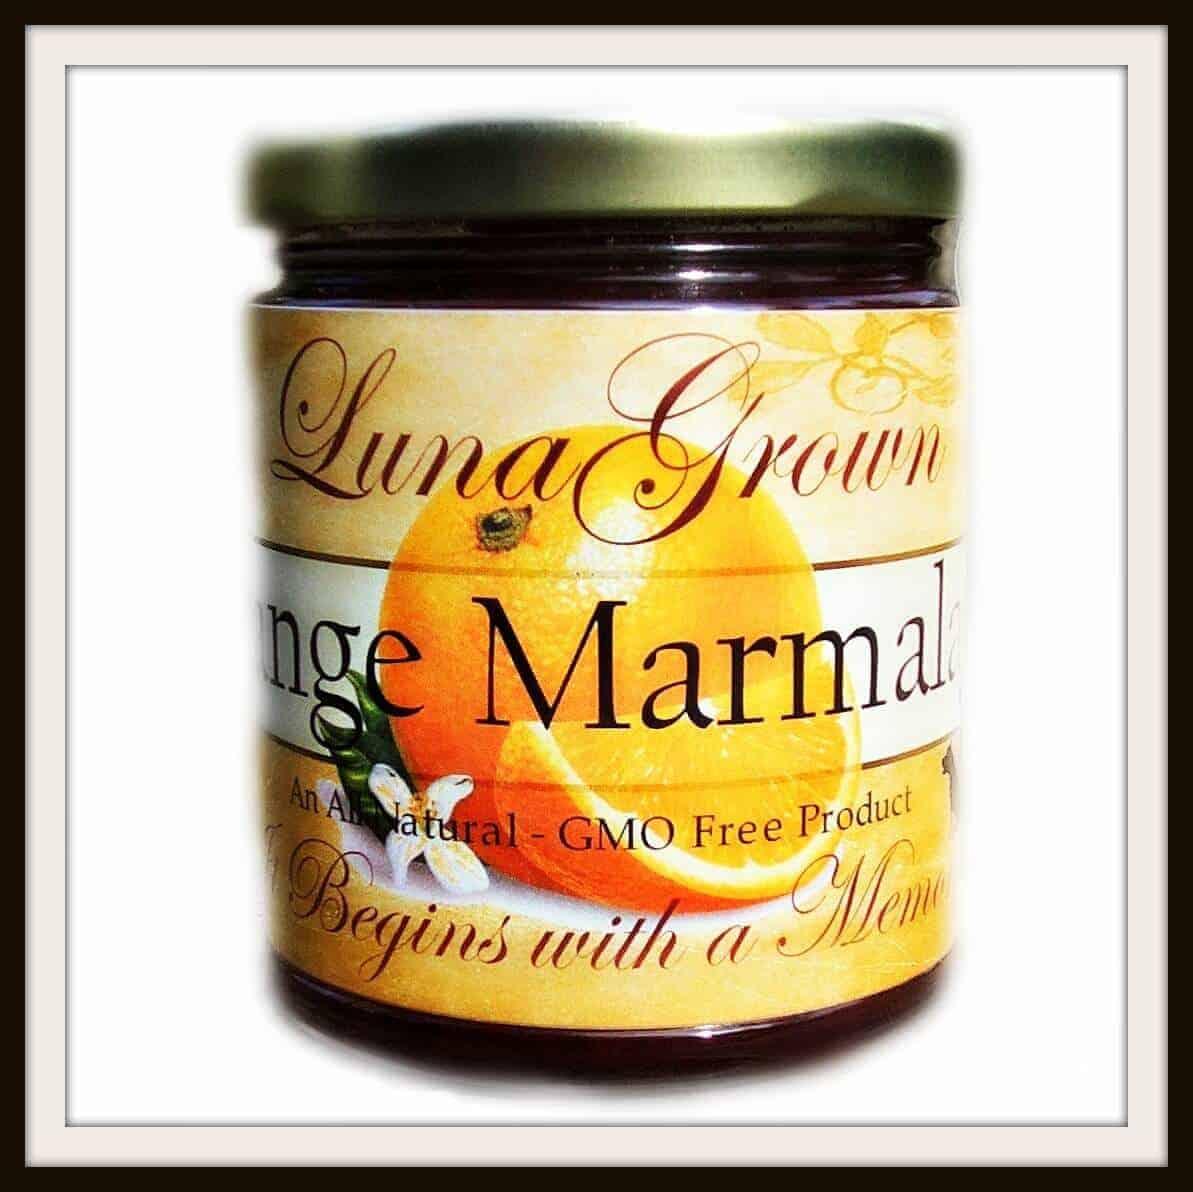 LunaGrown Orange Marmalade